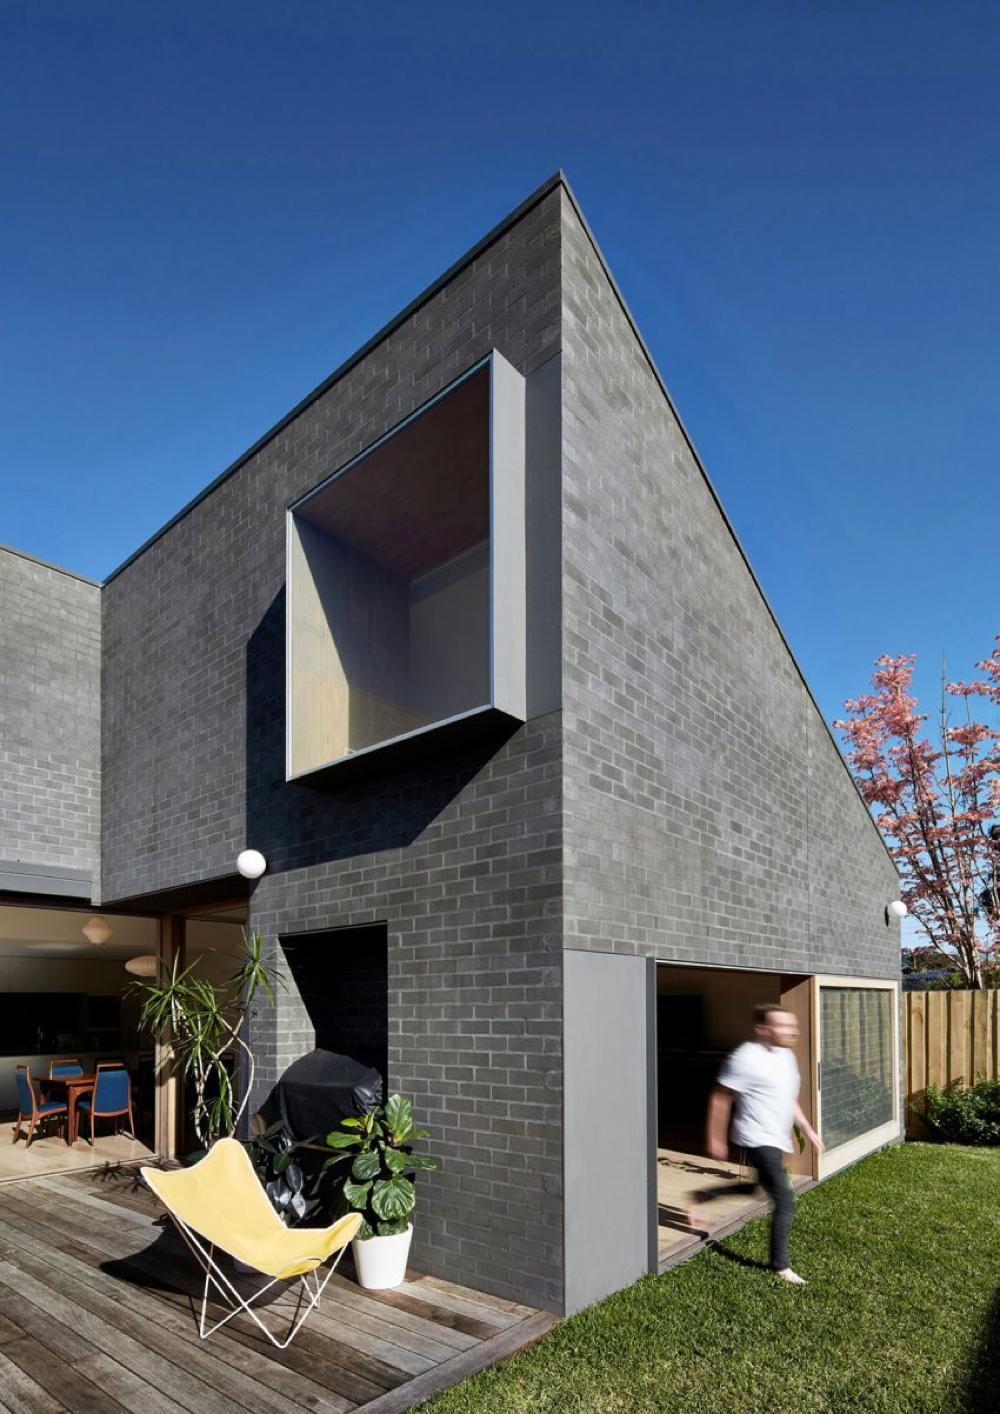 th_Hoddle-House-by-Freedman-White